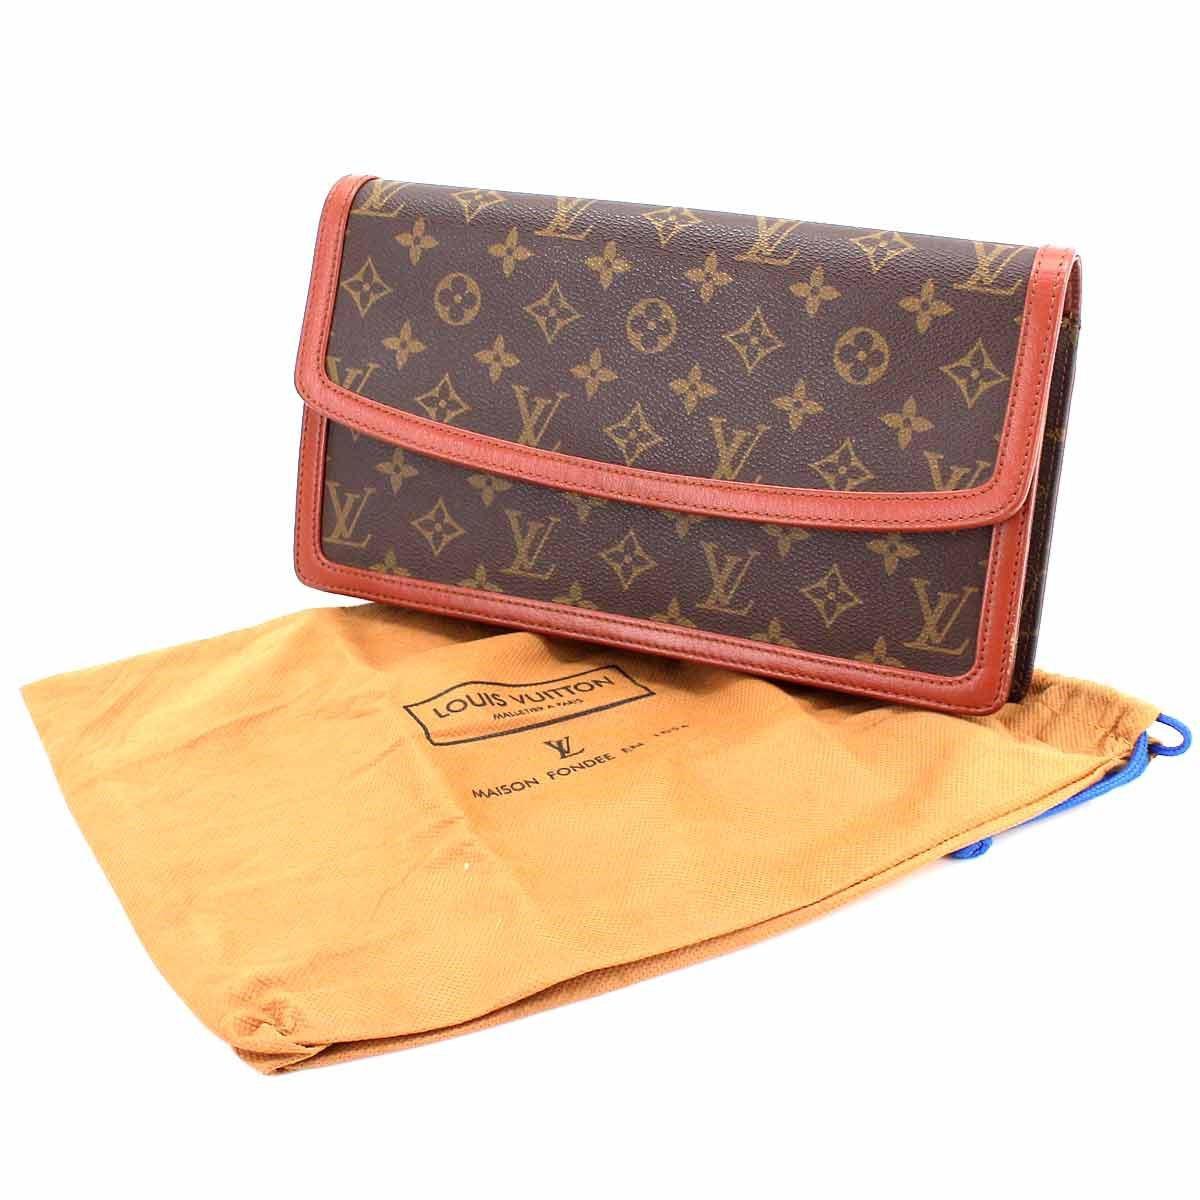 e663519fd975 Lyst - Louis Vuitton Monogram Pochette Dame Clutch Bag M51810 Purse ...